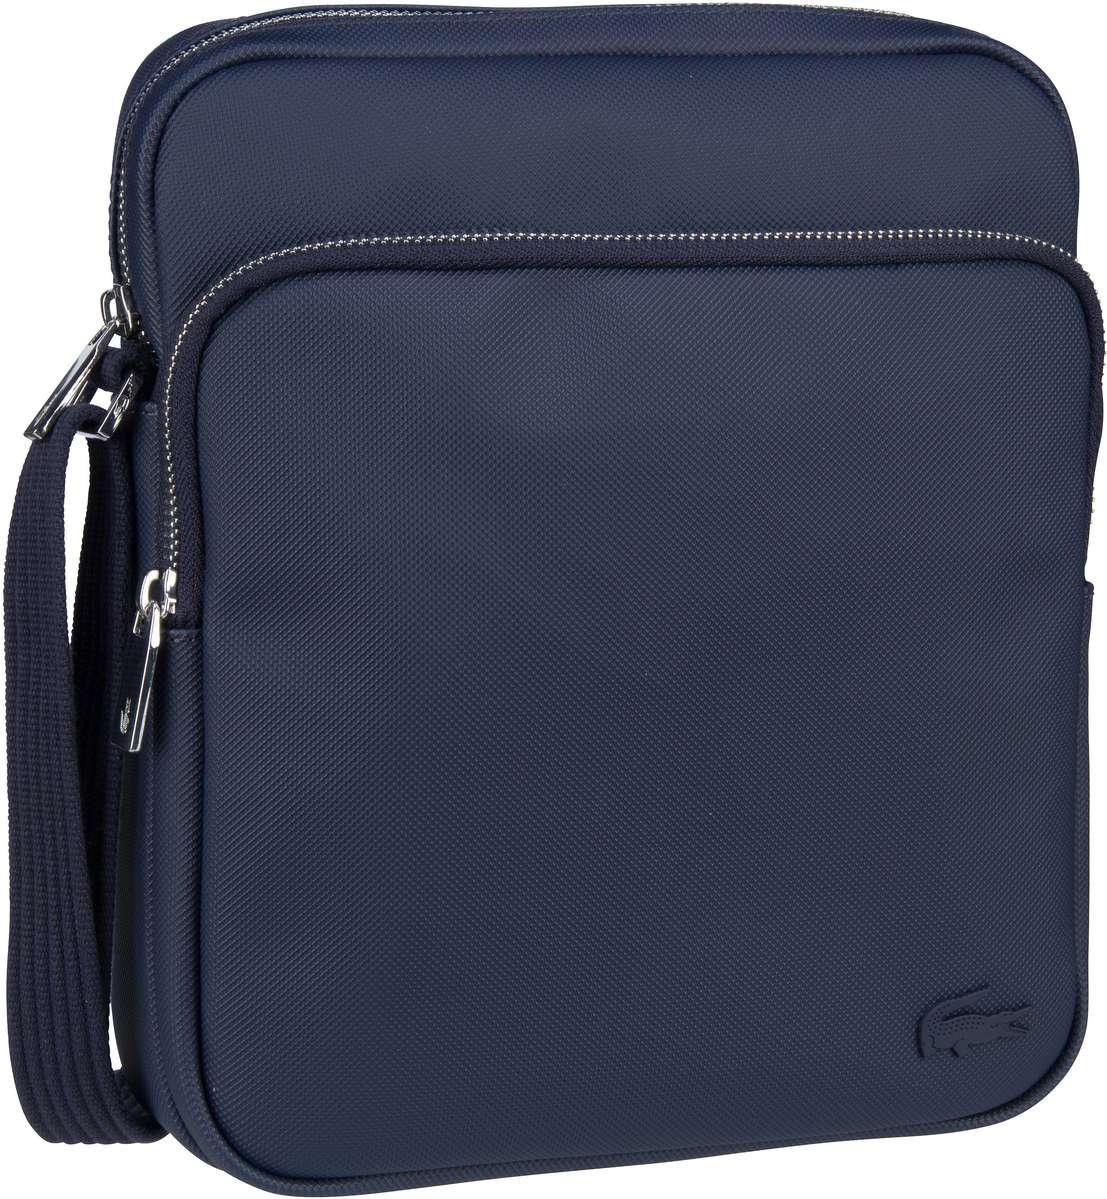 Umhängetasche Crossover Bag 2343 Peacoat